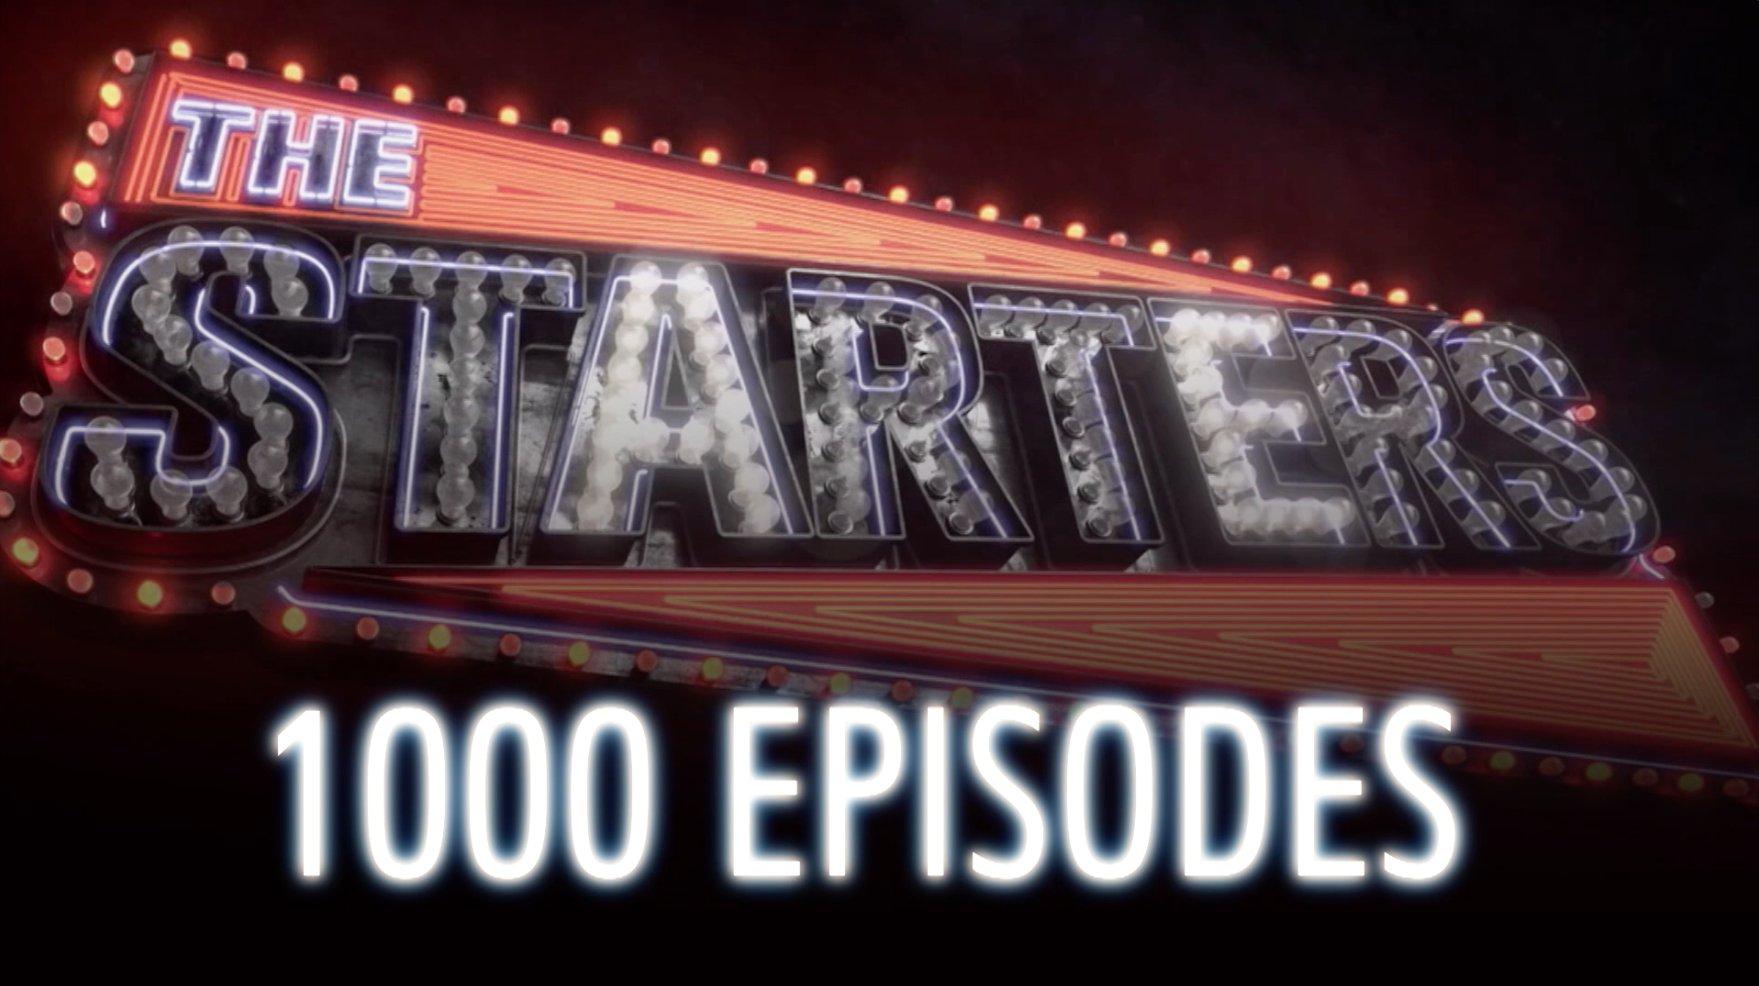 �� Don't miss history tomorrow night as #TheStarters hit Episode #️⃣1️⃣0️⃣0️⃣0️⃣ on NBA TV ��! �� https://t.co/uY21bn1AyK